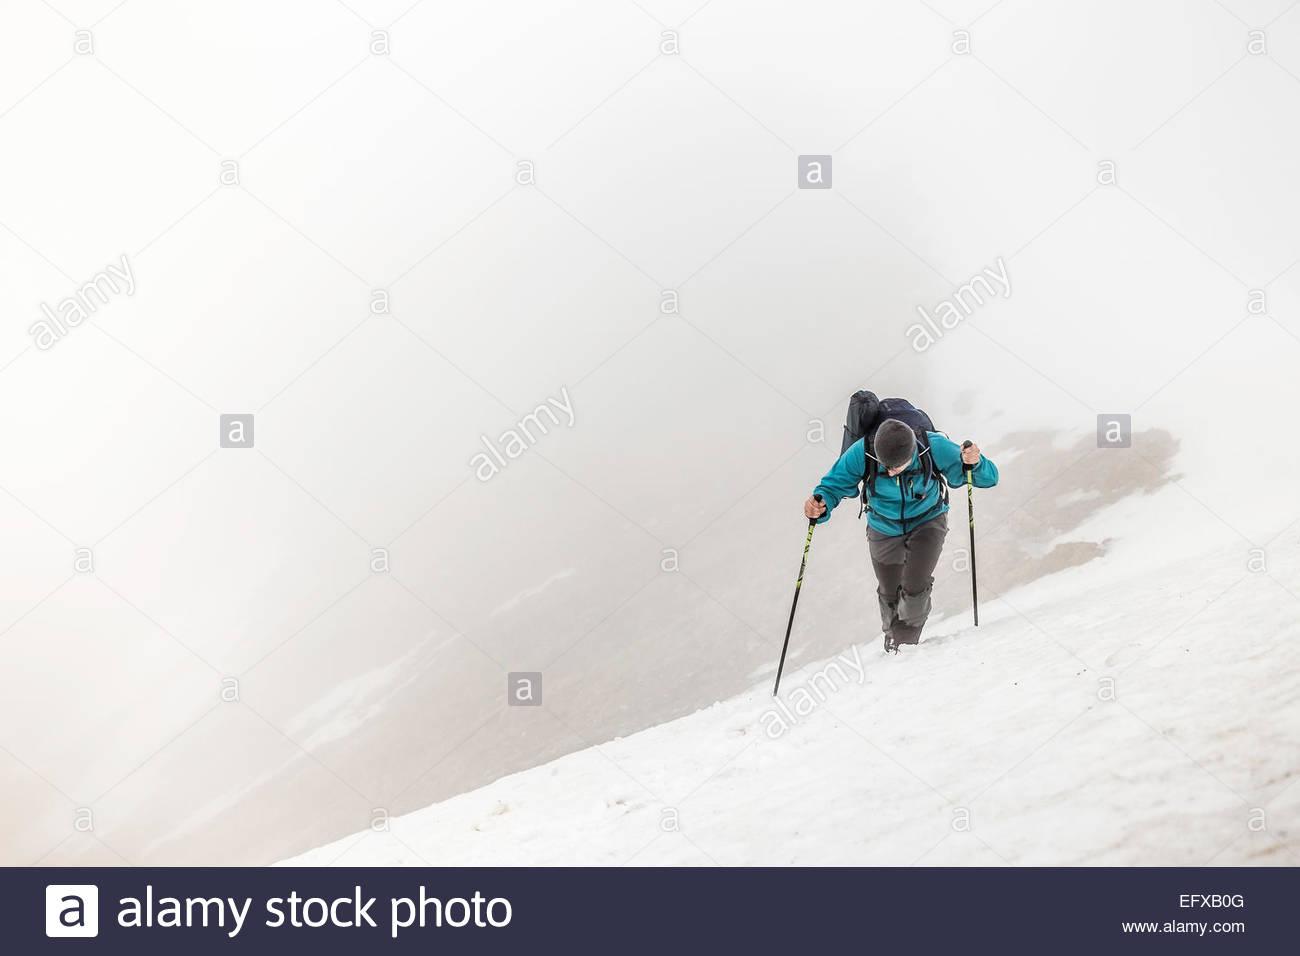 Man mountain trekking in mist, Bavarian Alps, Oberstdorf, Bavaria, Germany - Stock Image